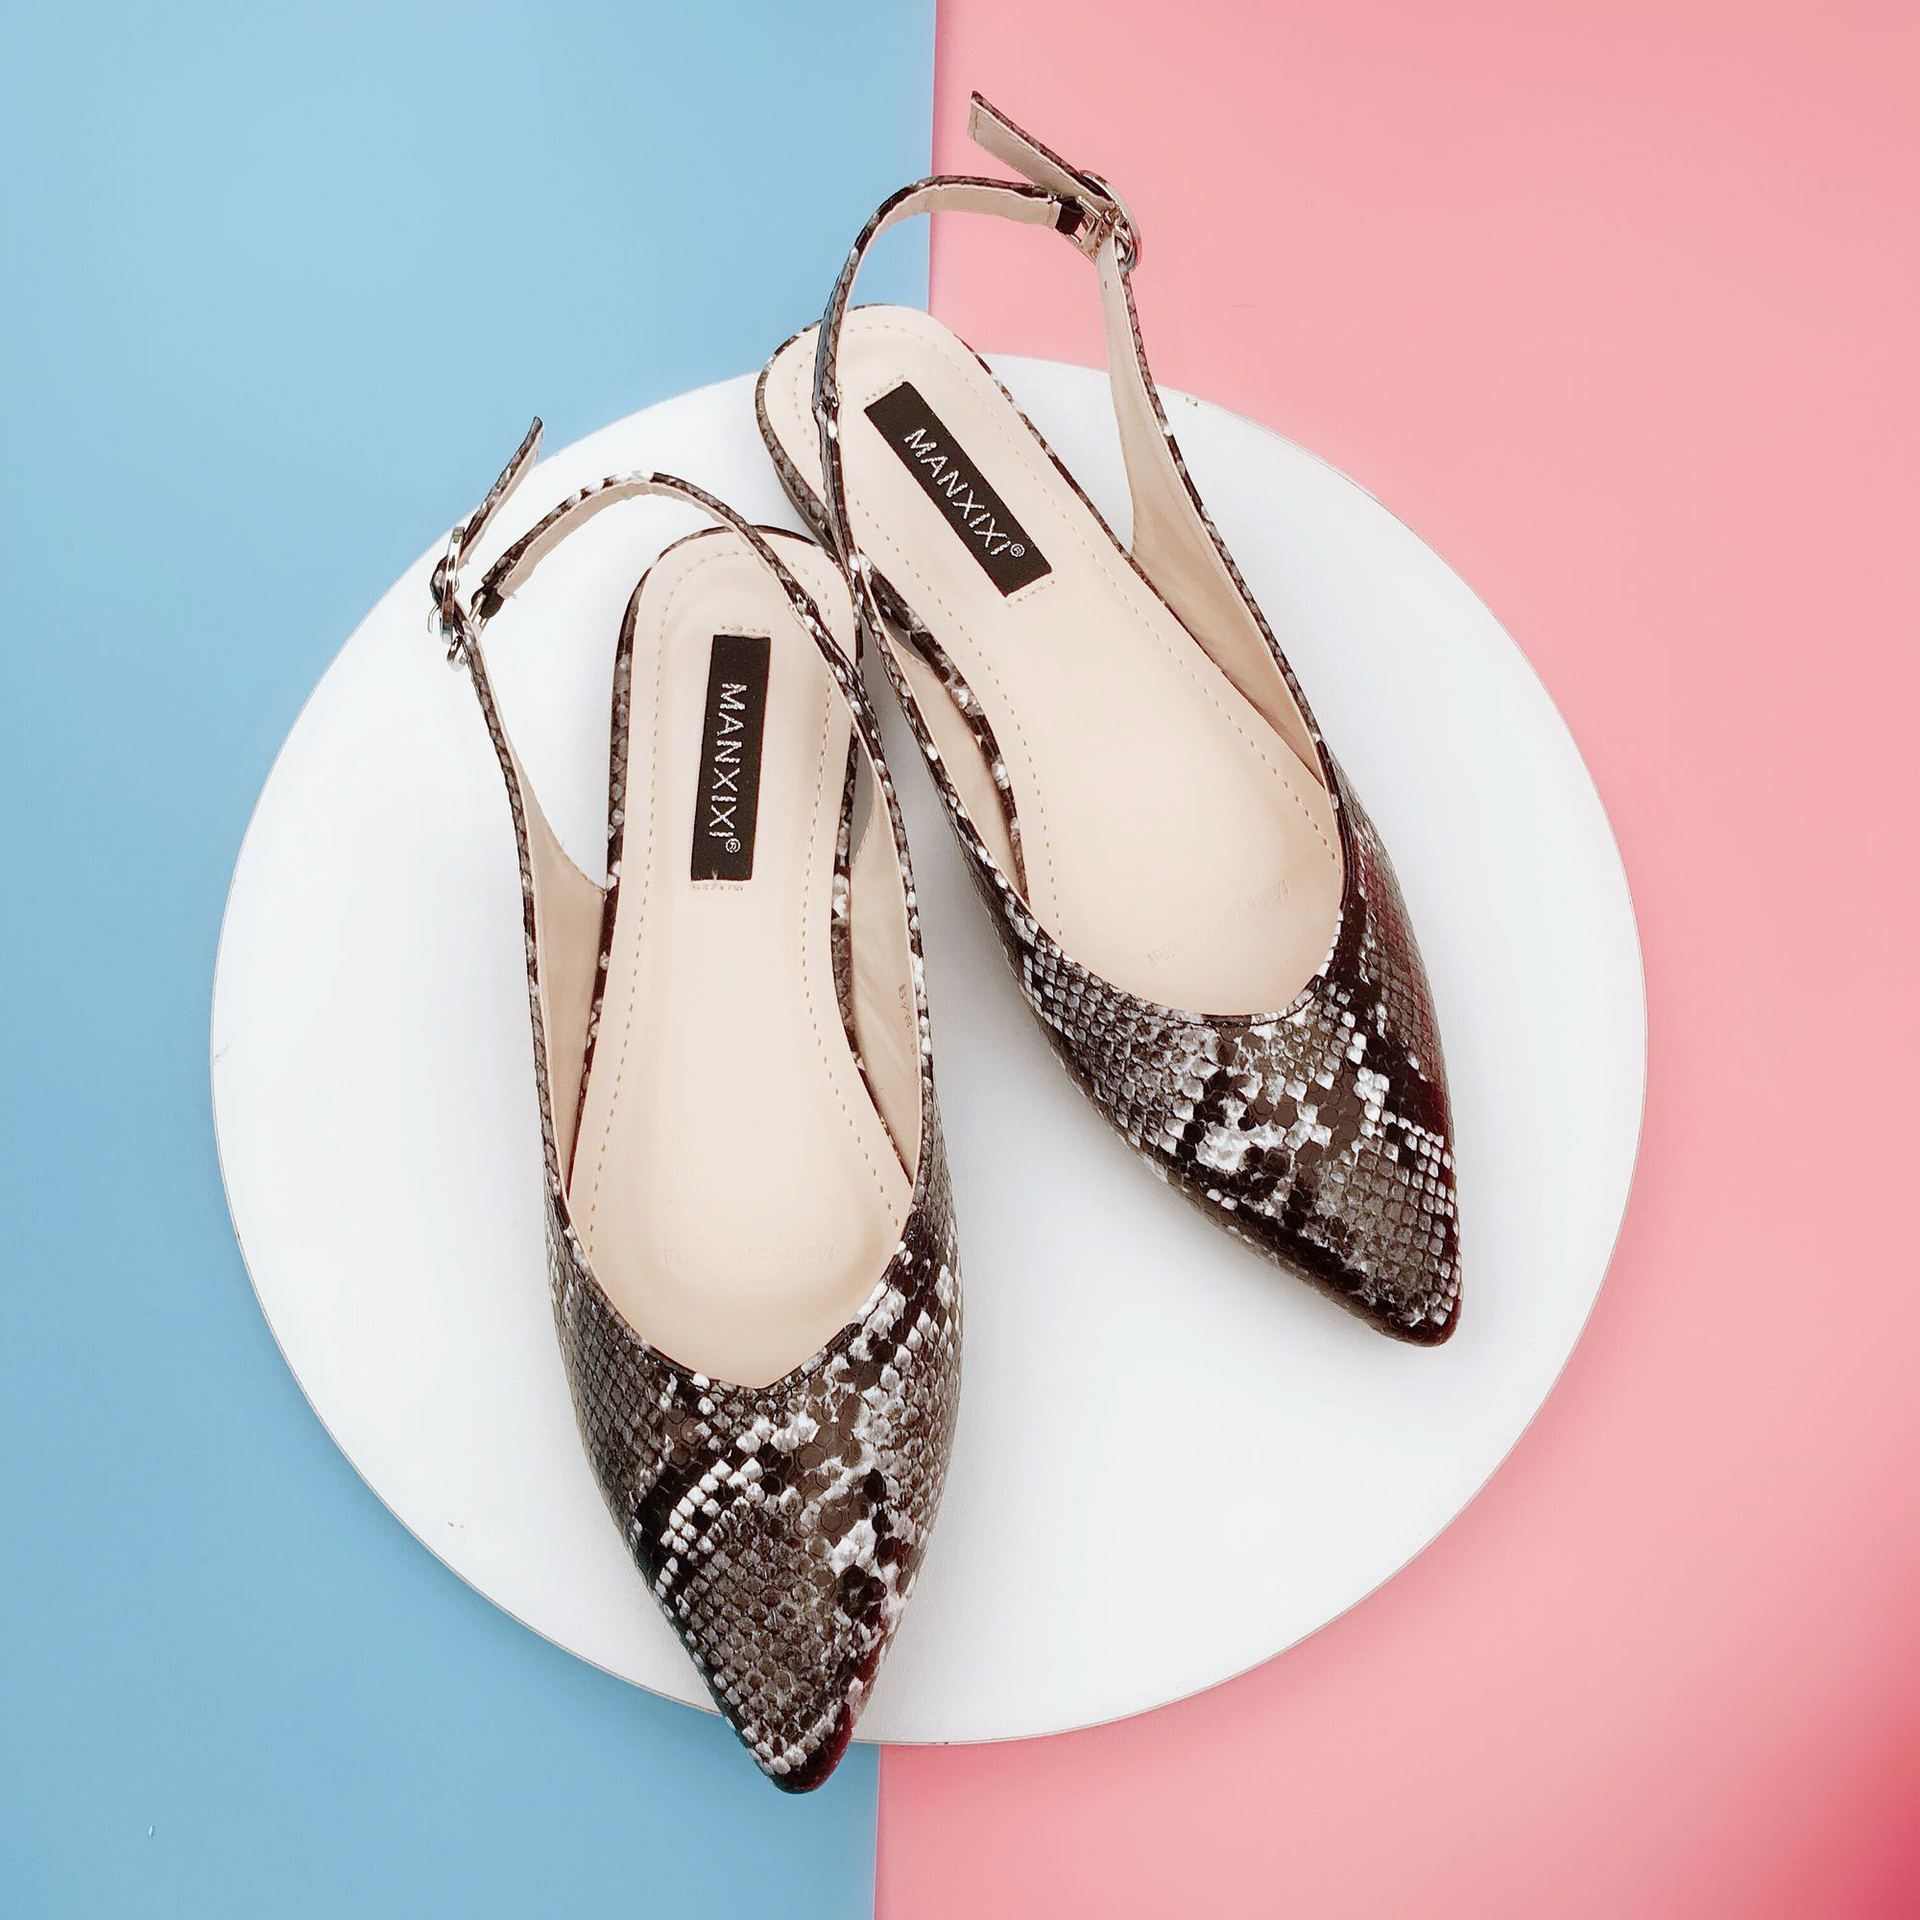 Pretty2019 змея Xiashushi зерна острый мелкий рот плоское дно сандалии низкий с 40 код женской обуви